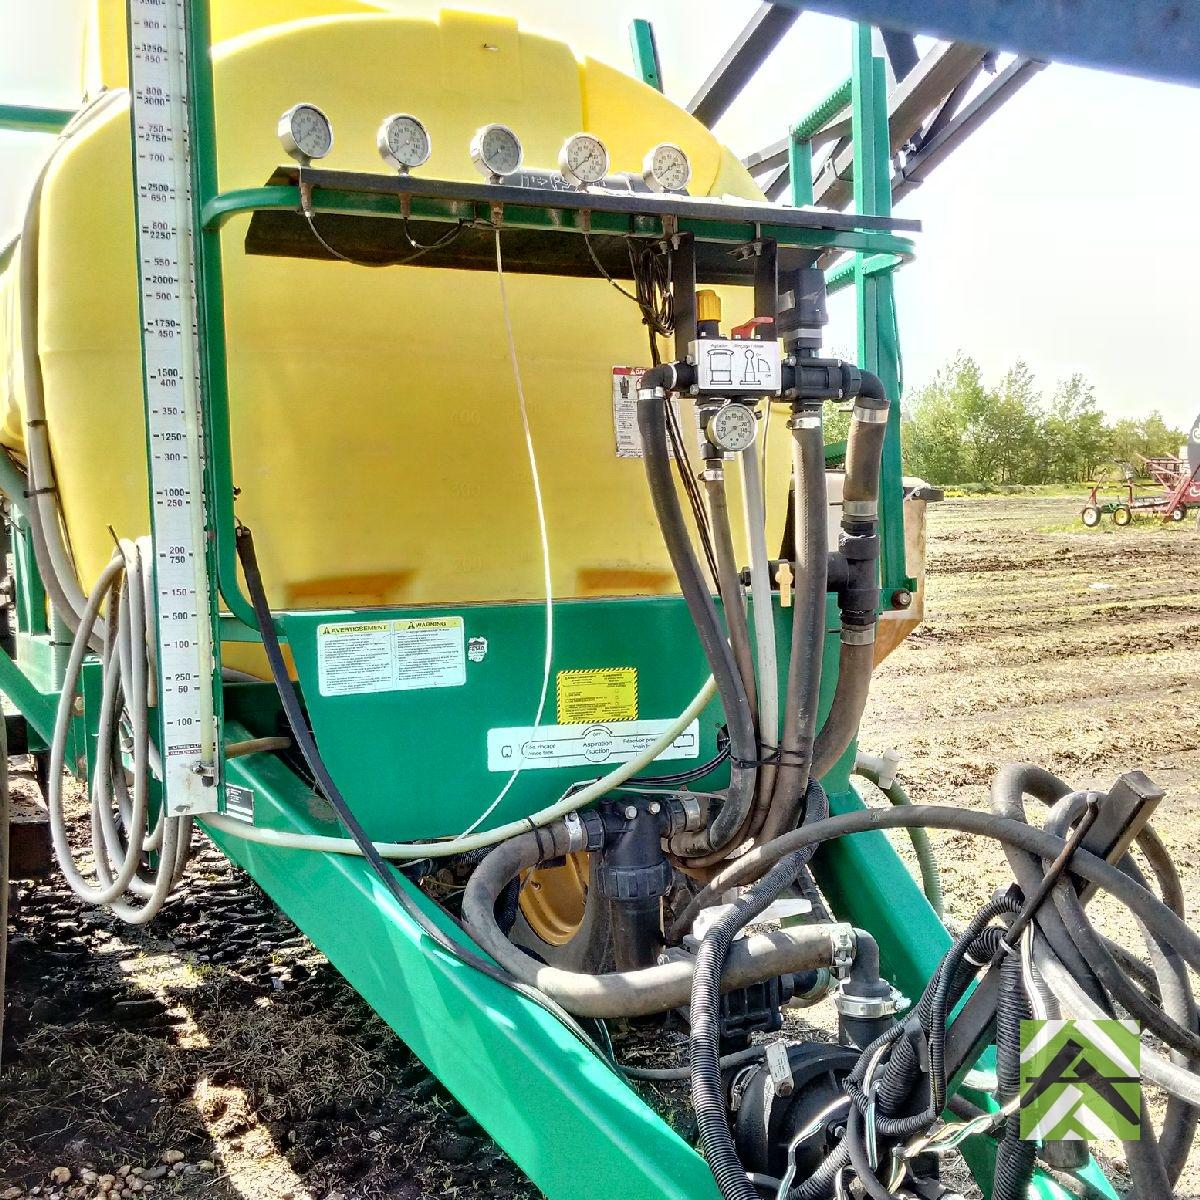 MS sprayer 1000 gallons - 19,000$